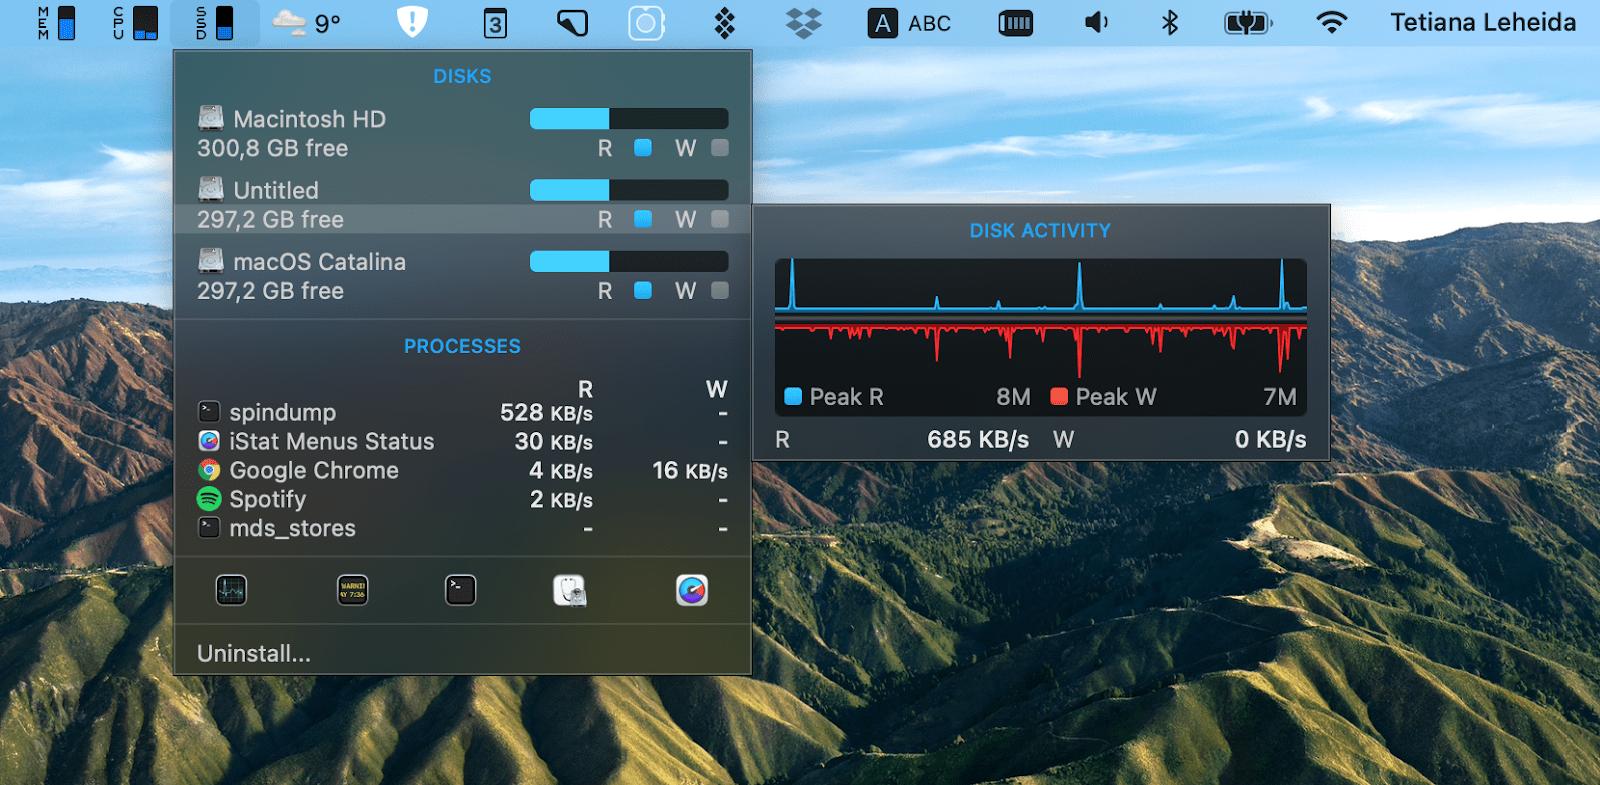 check processes iStat Menus